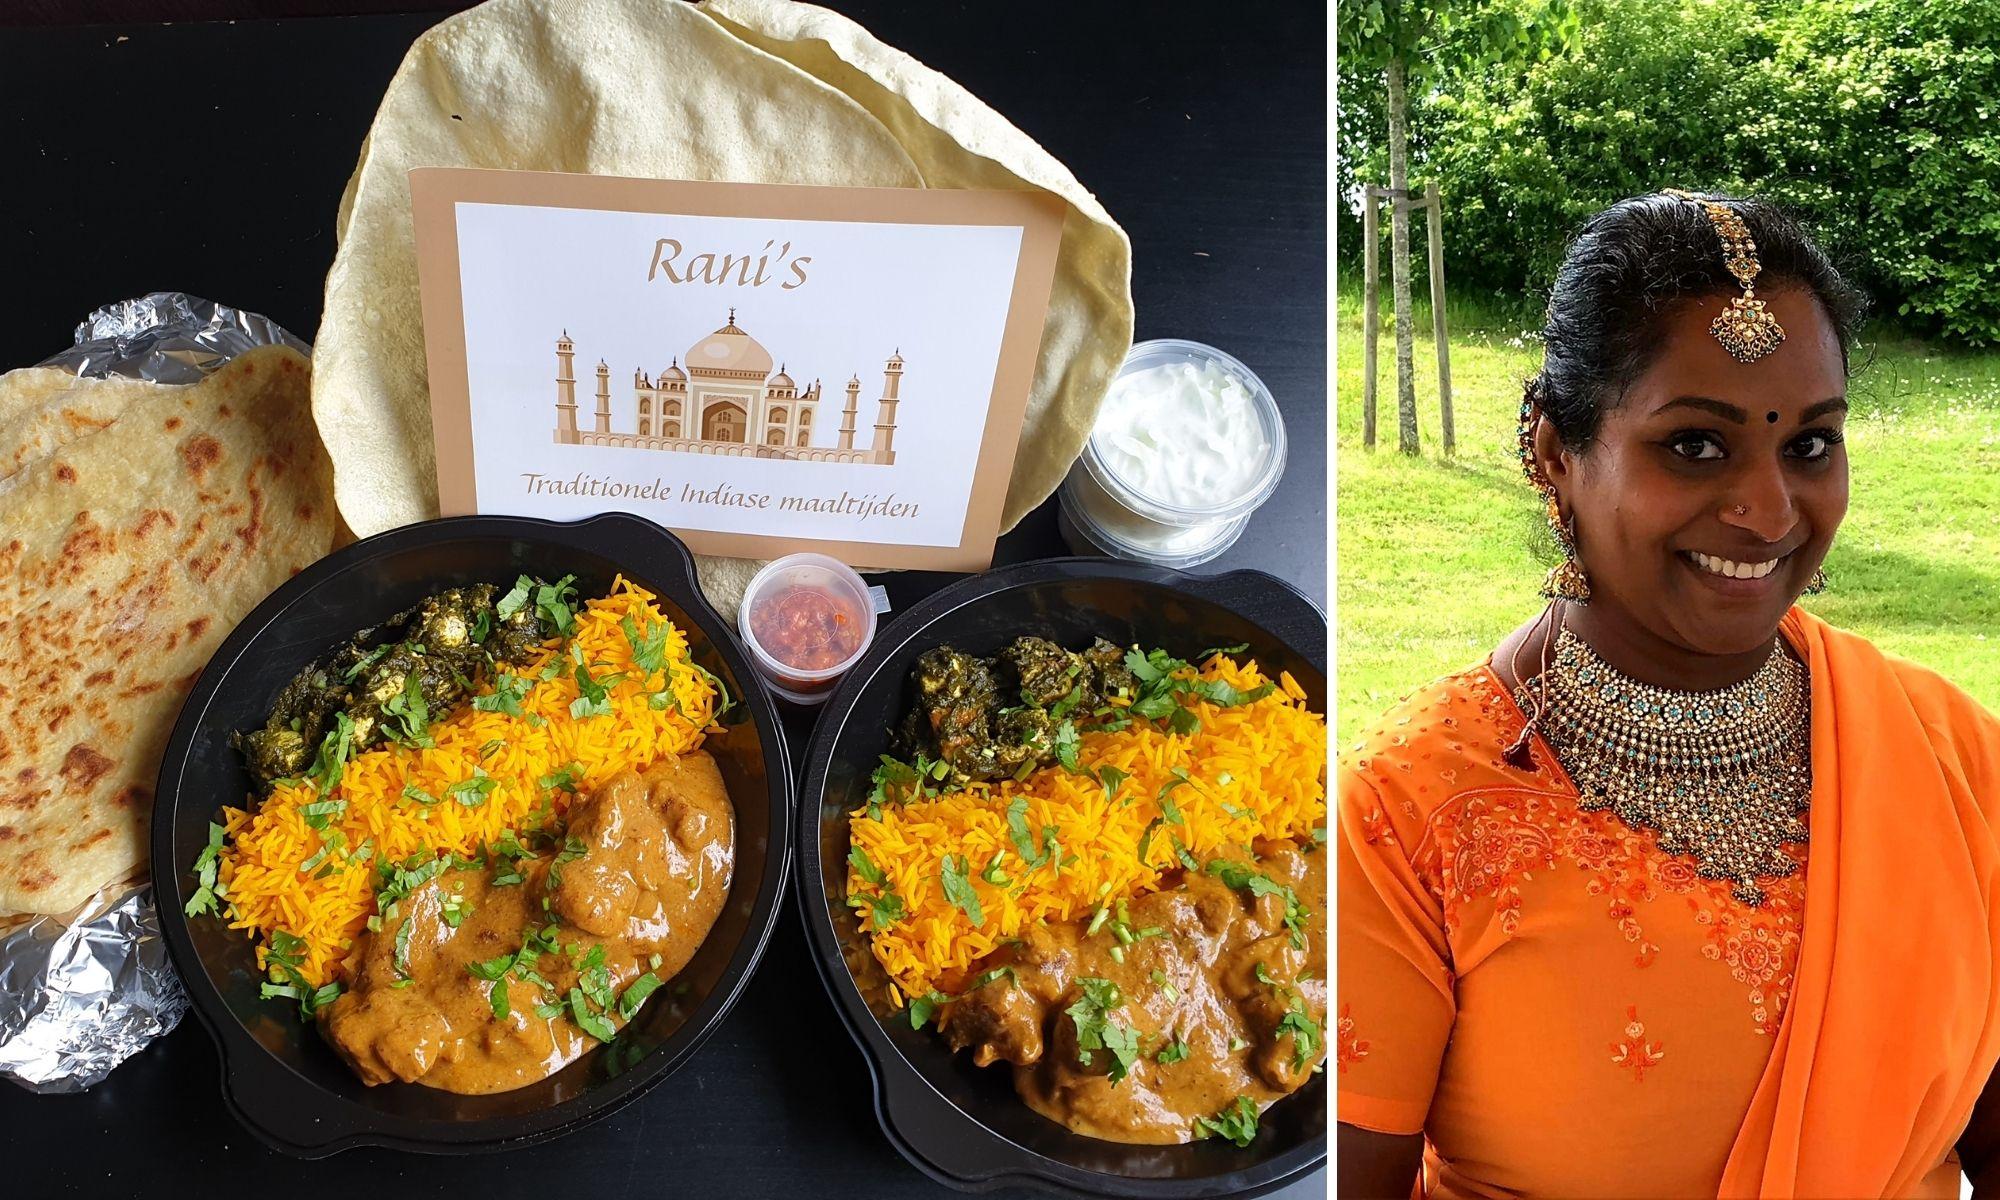 Rani's – Traditionele Indiase maaltijden